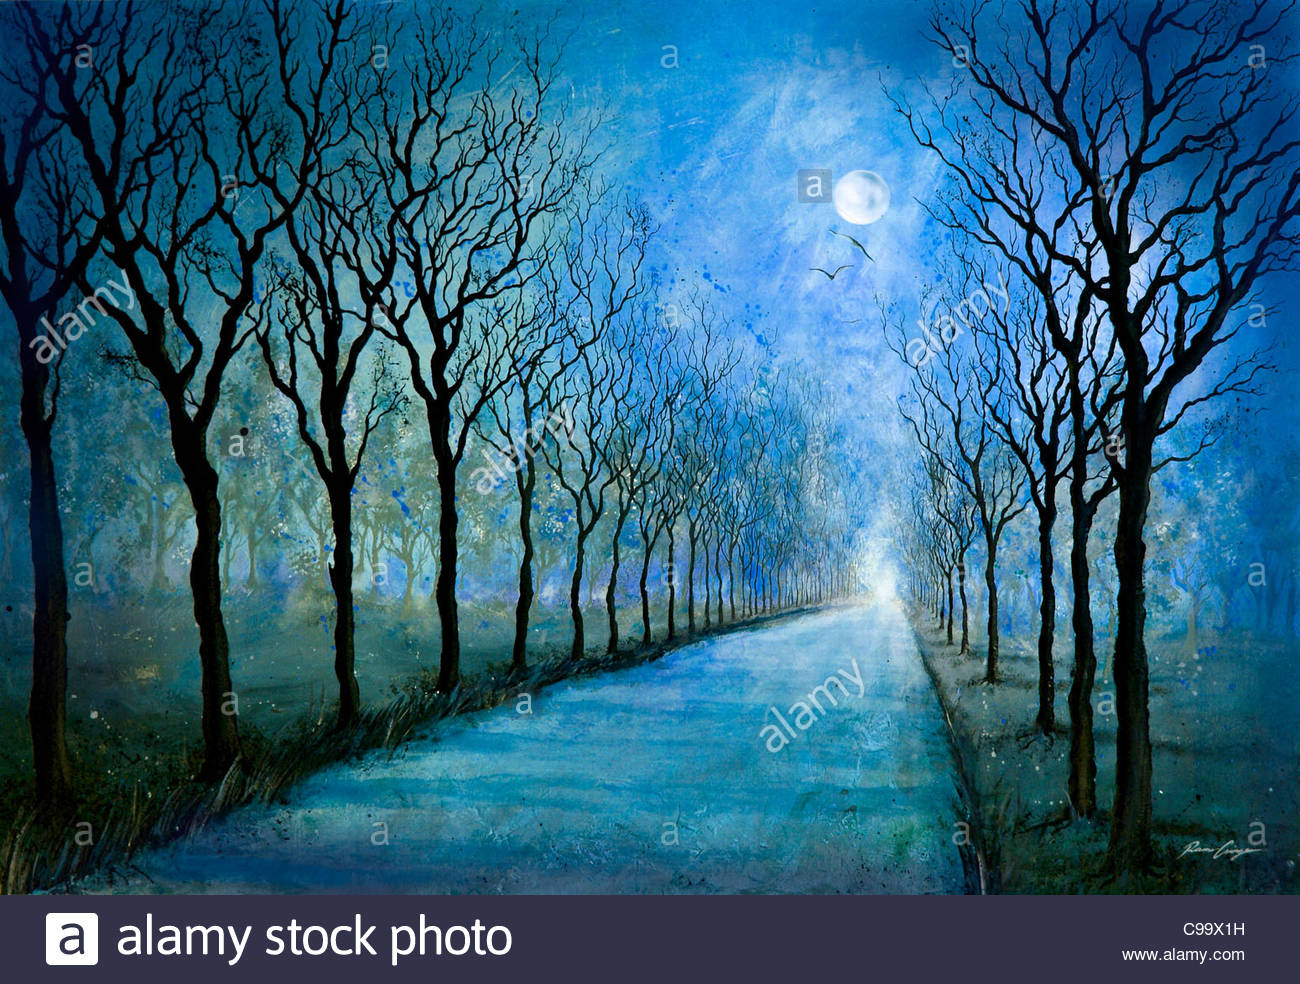 Night way WAy Street night moonlight full moon Allee baume ride vehicle tra - Stock Image